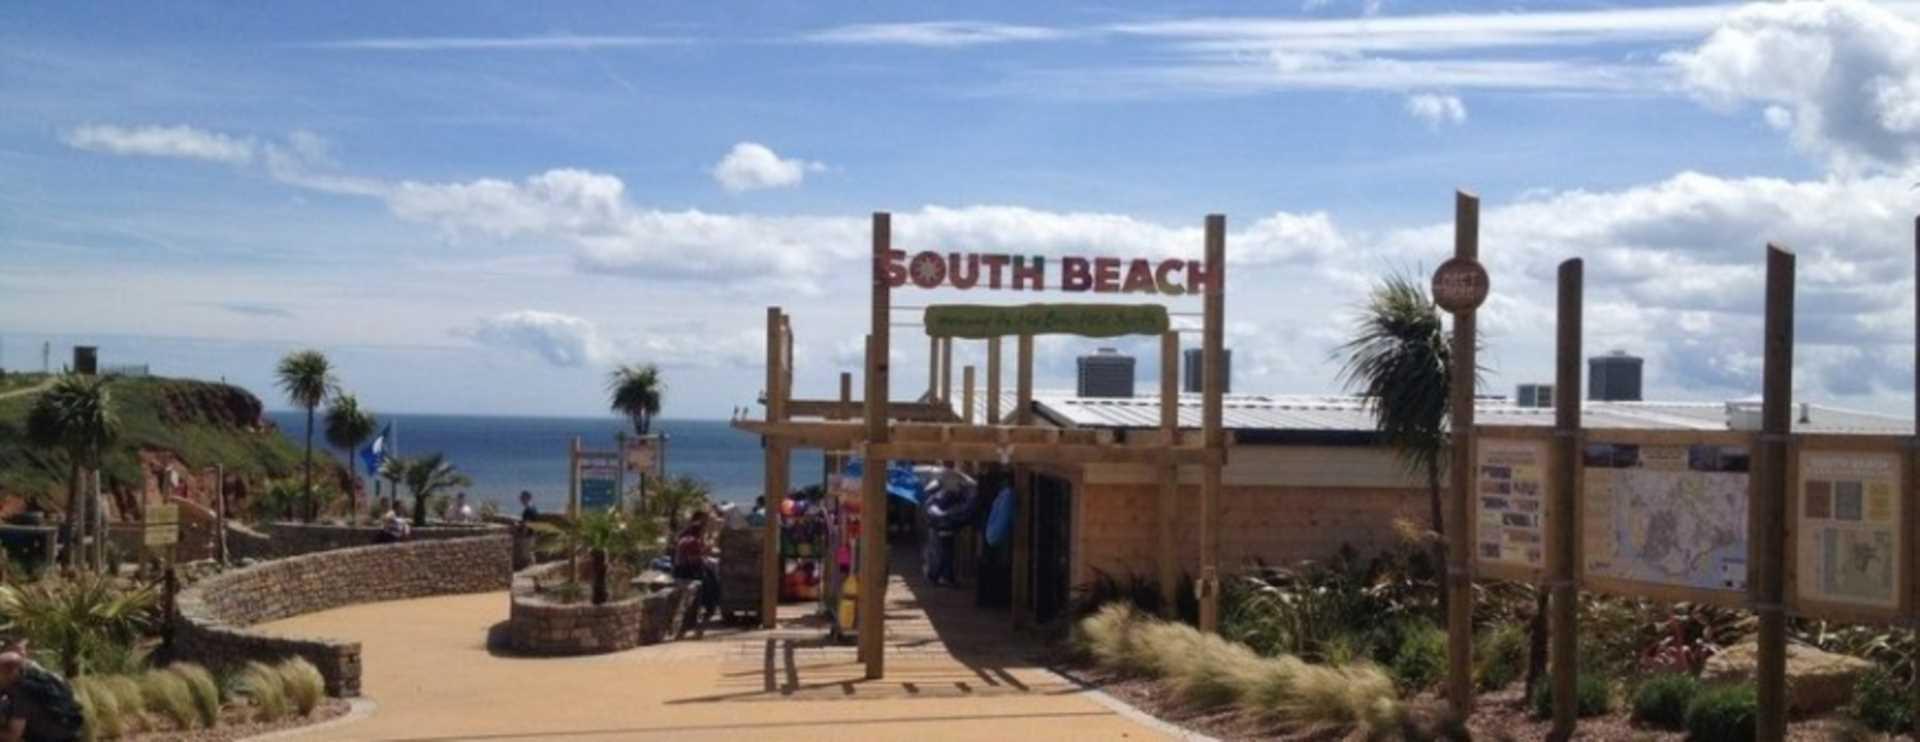 Beautiful Devon Cliffs Holiday Park Exmouth 3 Bed Caravan For Sale  25000